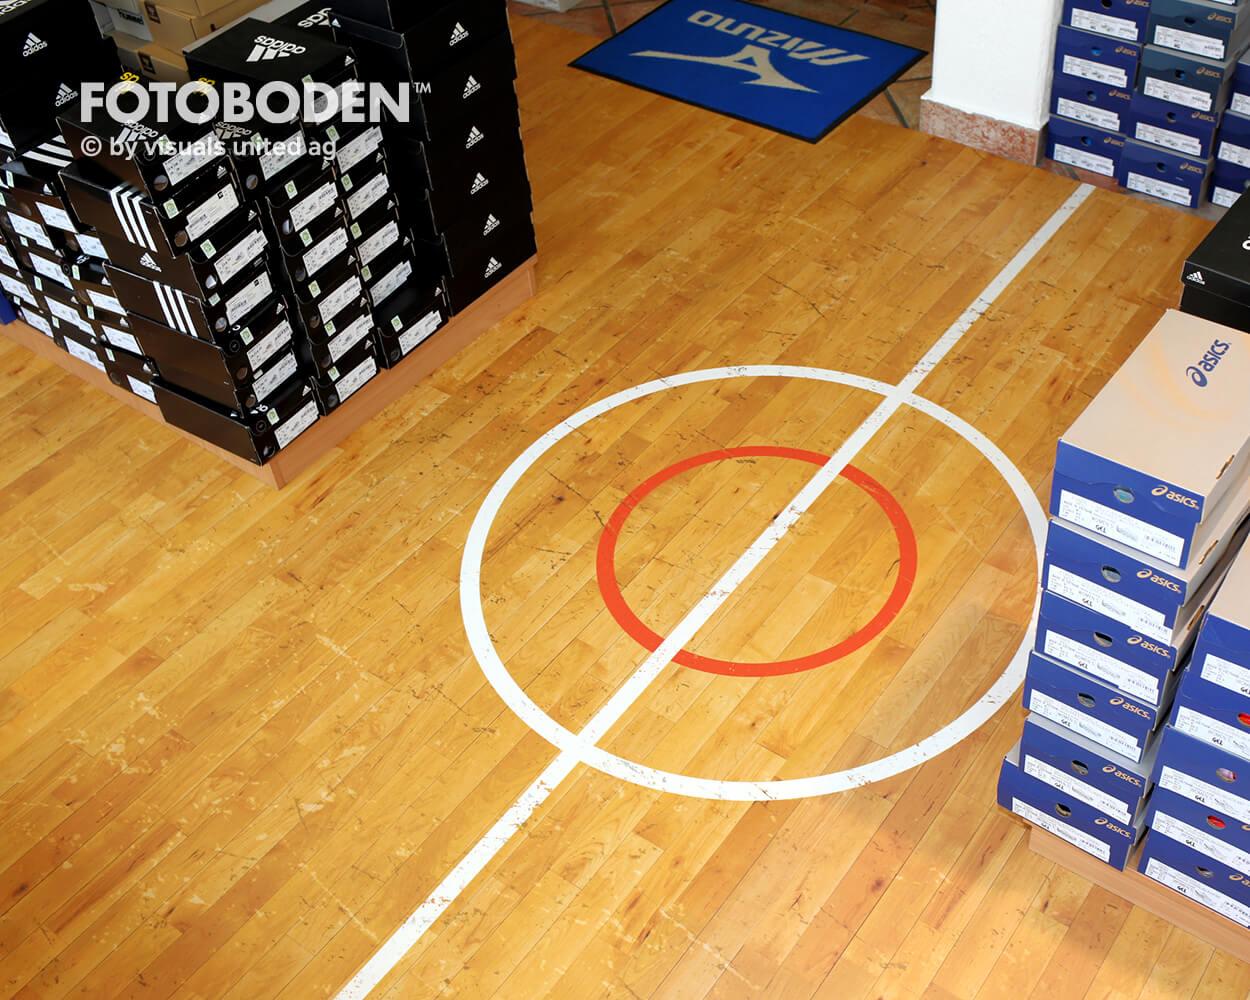 Sport6Ladenbau Ladengestaltung Fußboden Verkaufsfläche Bodengestaltung Boden Foto Fotoboden Fotomotiv Motiv Druck Visual Merchandising Point Of Sale POS